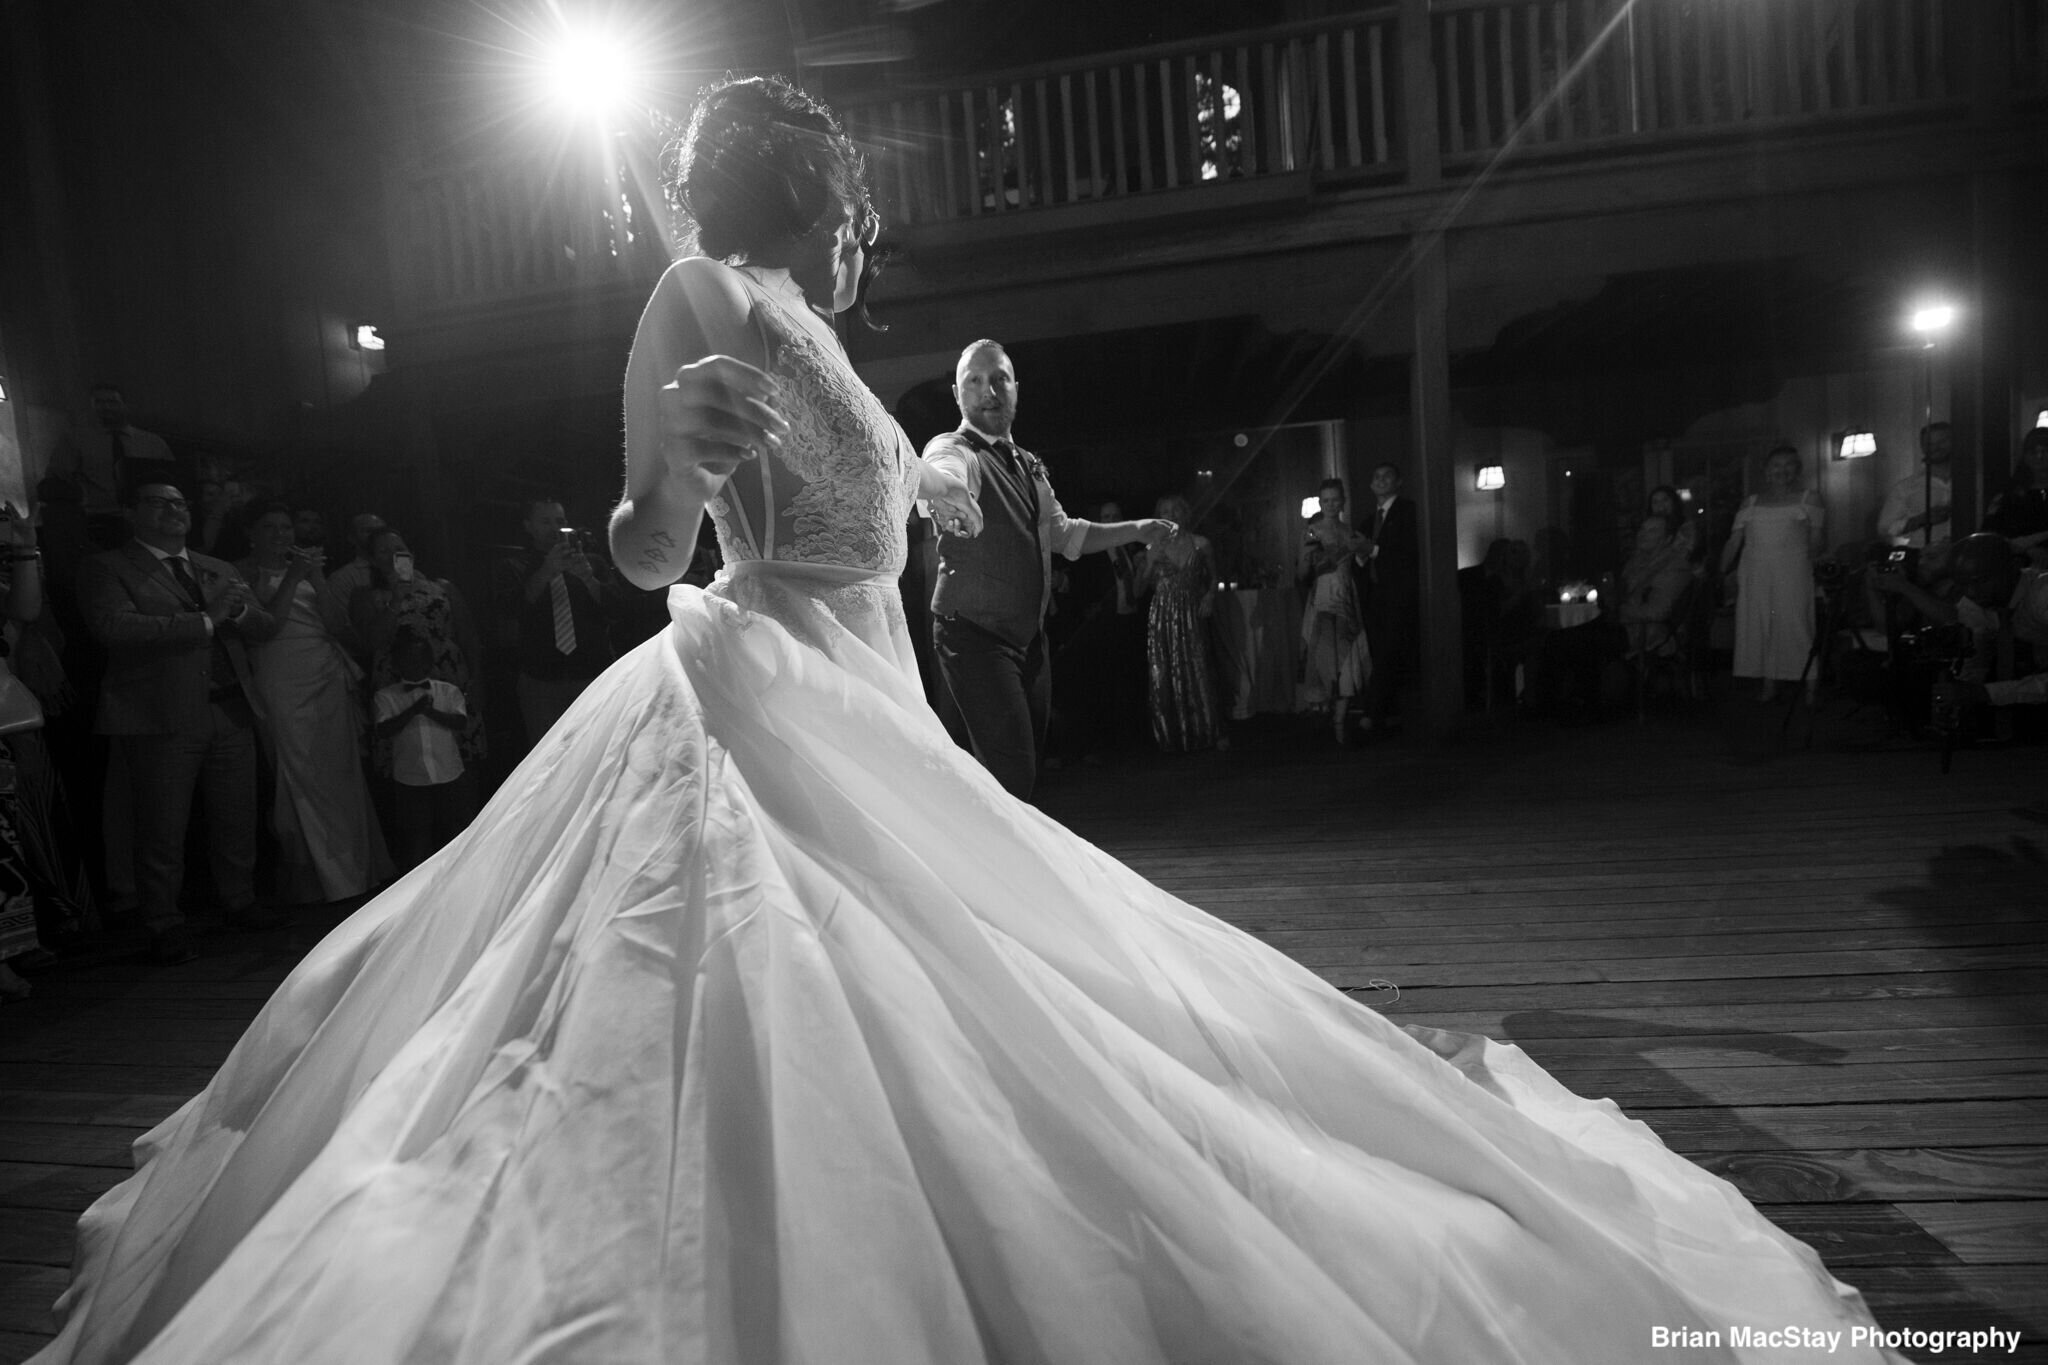 Demi & Josh Dancing Photo - Brian MacStay Photography.jpeg